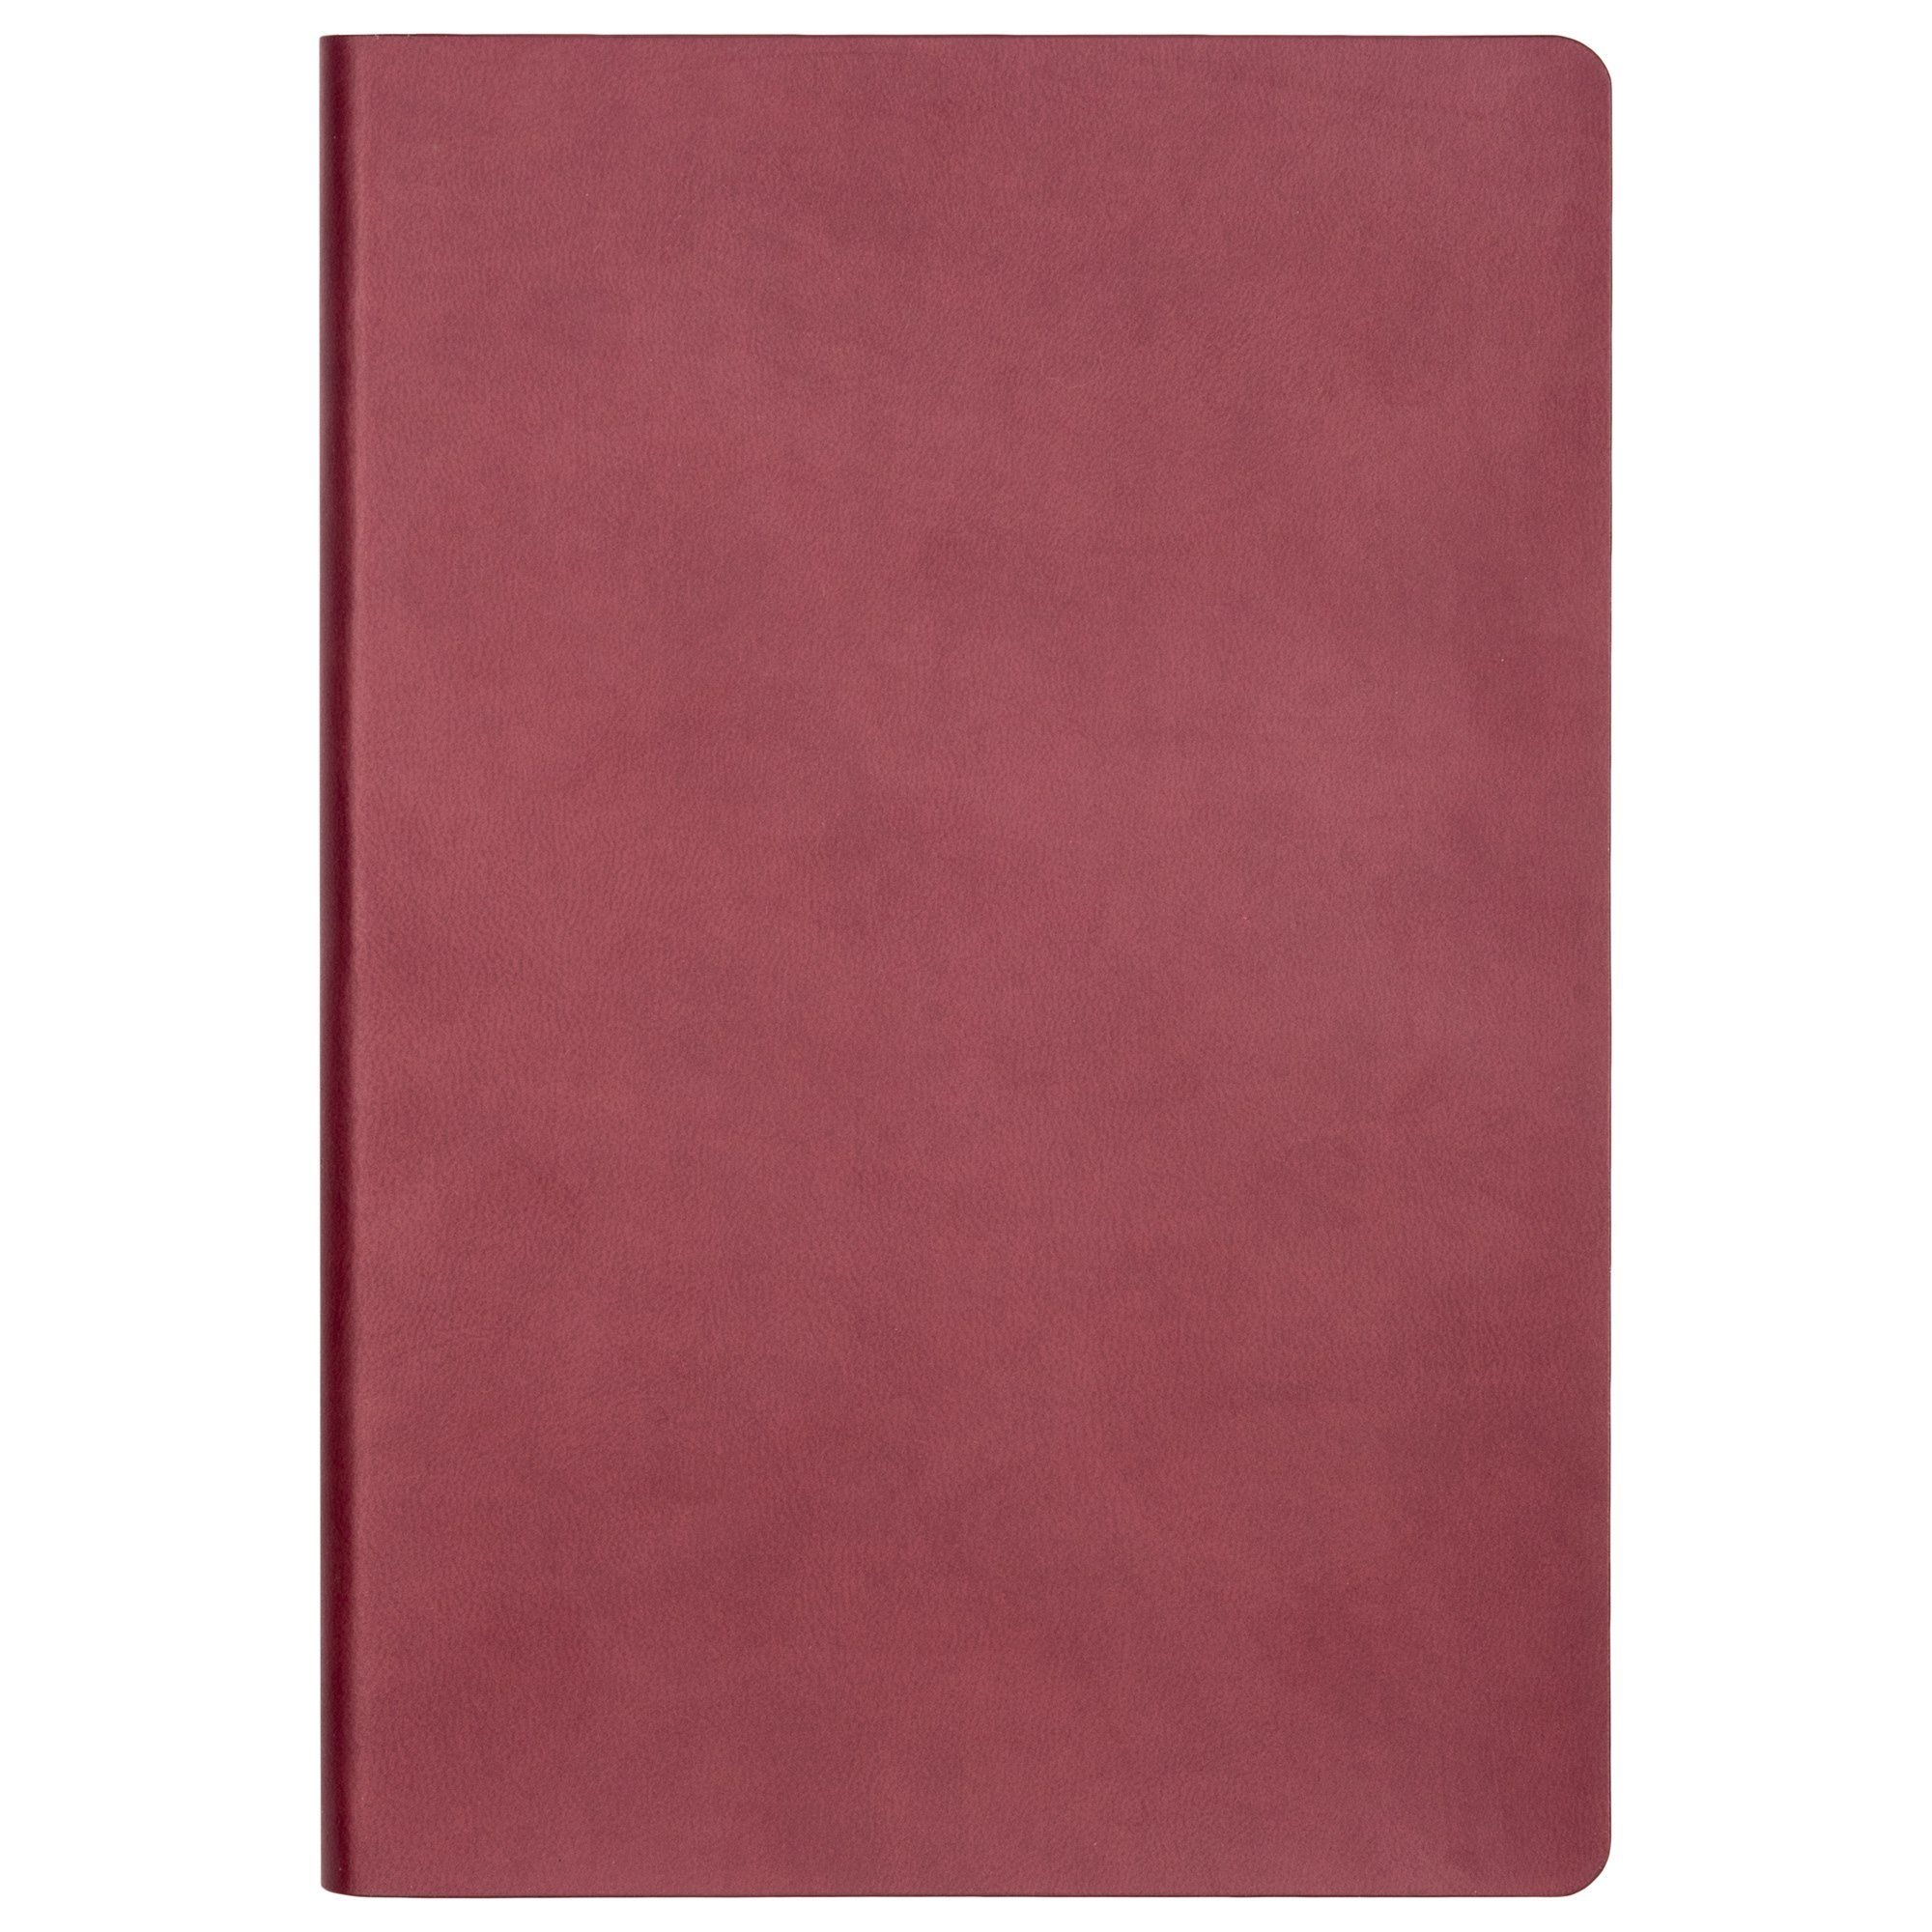 Ежедневник недатированный, Portobello Trend, Sky, 145х210, 256стр, бургунди, темный форзац